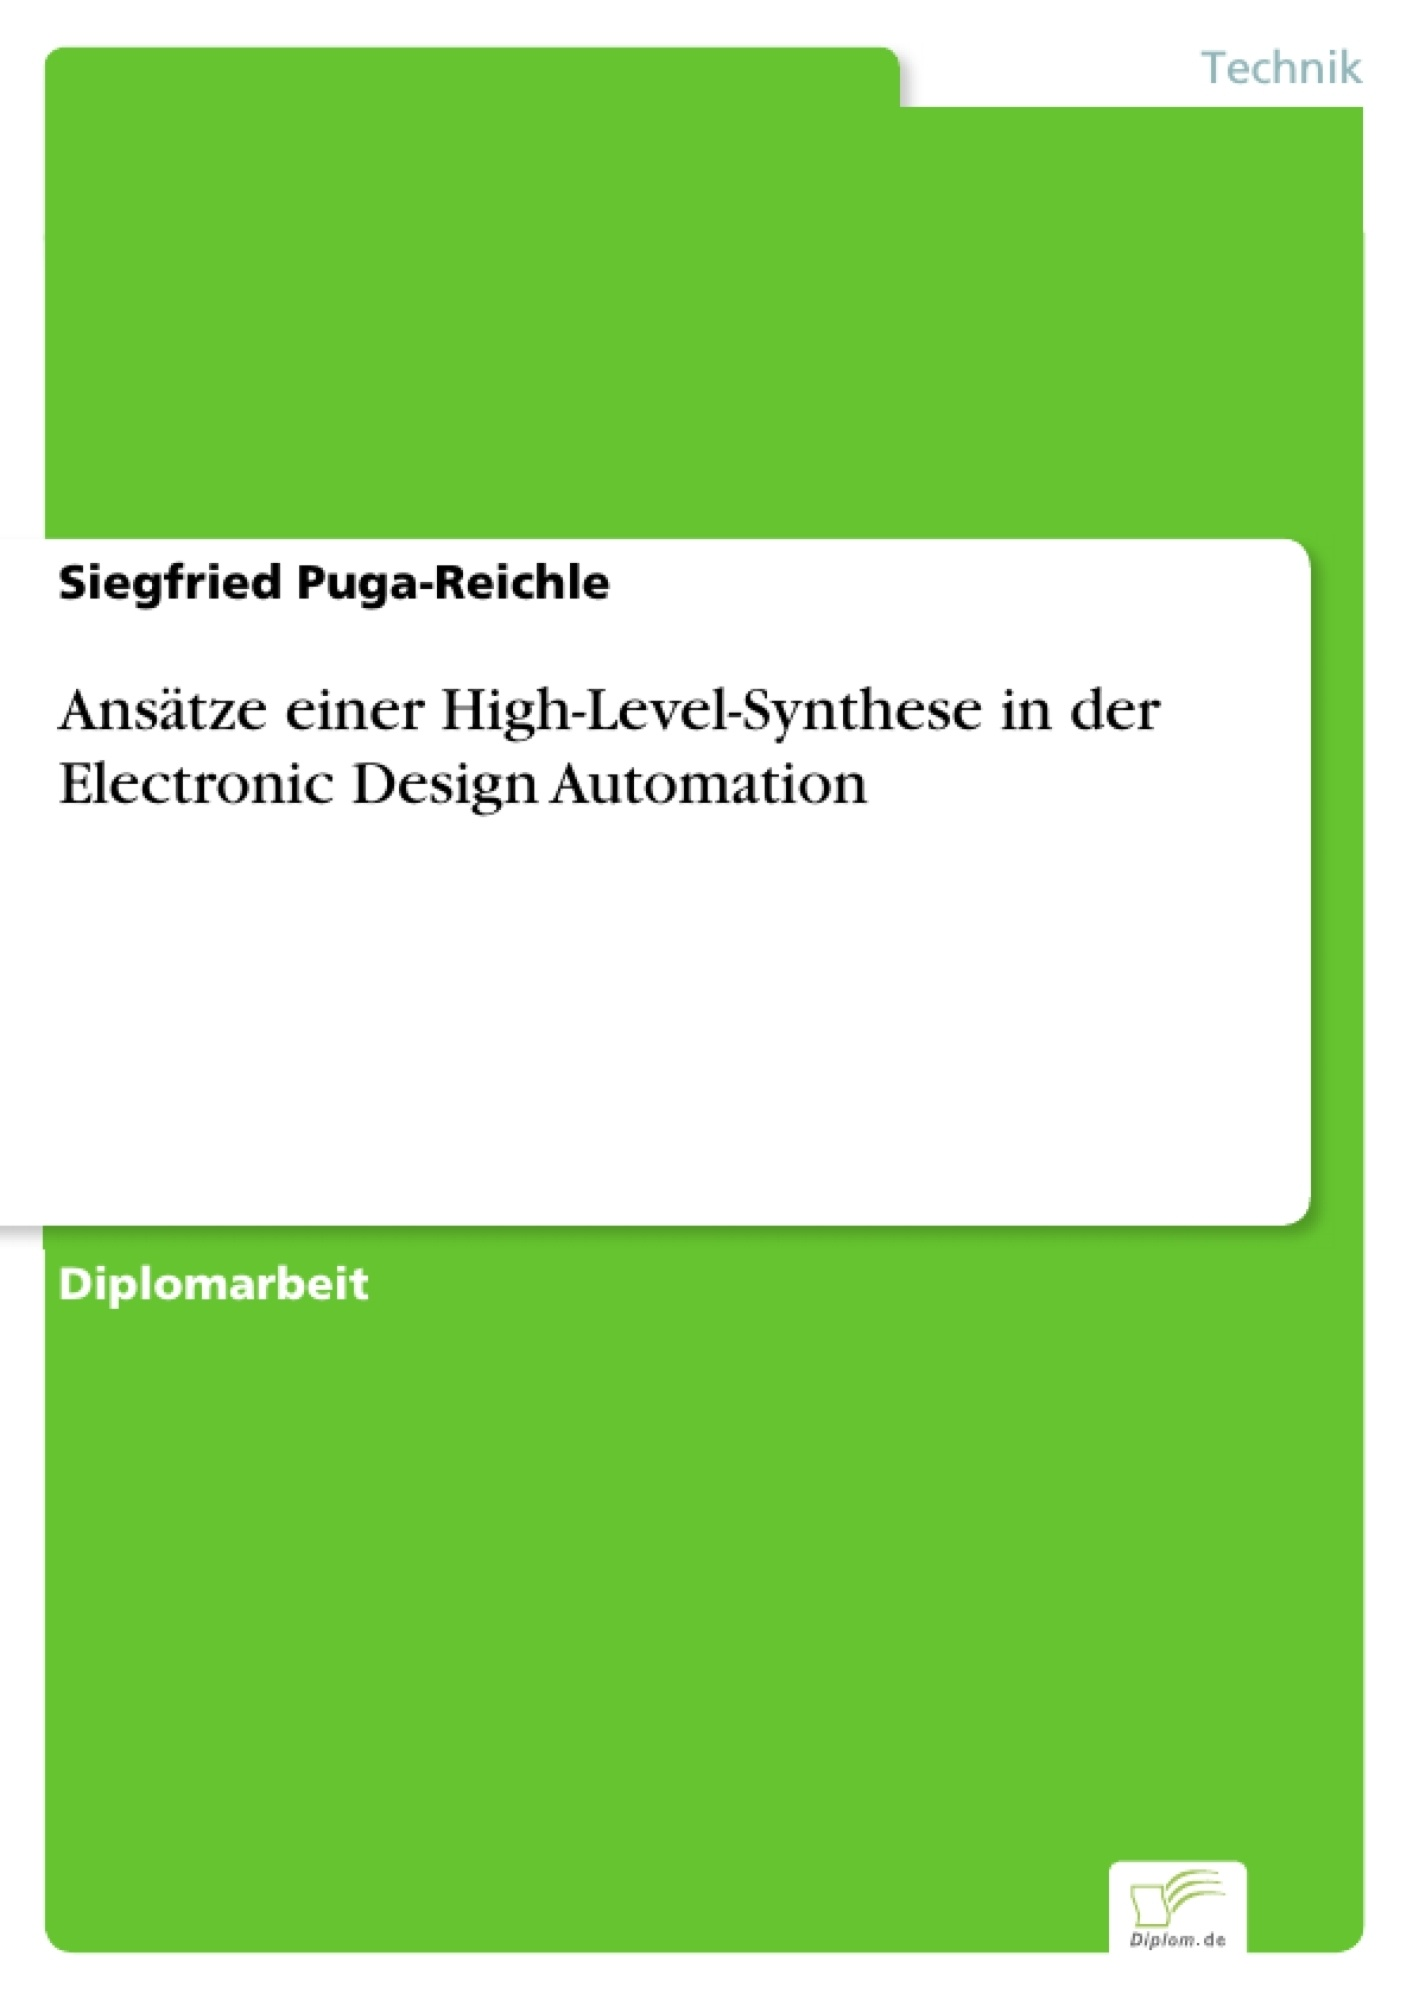 Ansätze einer High-Level-Synthese in der Electronic Design Automation